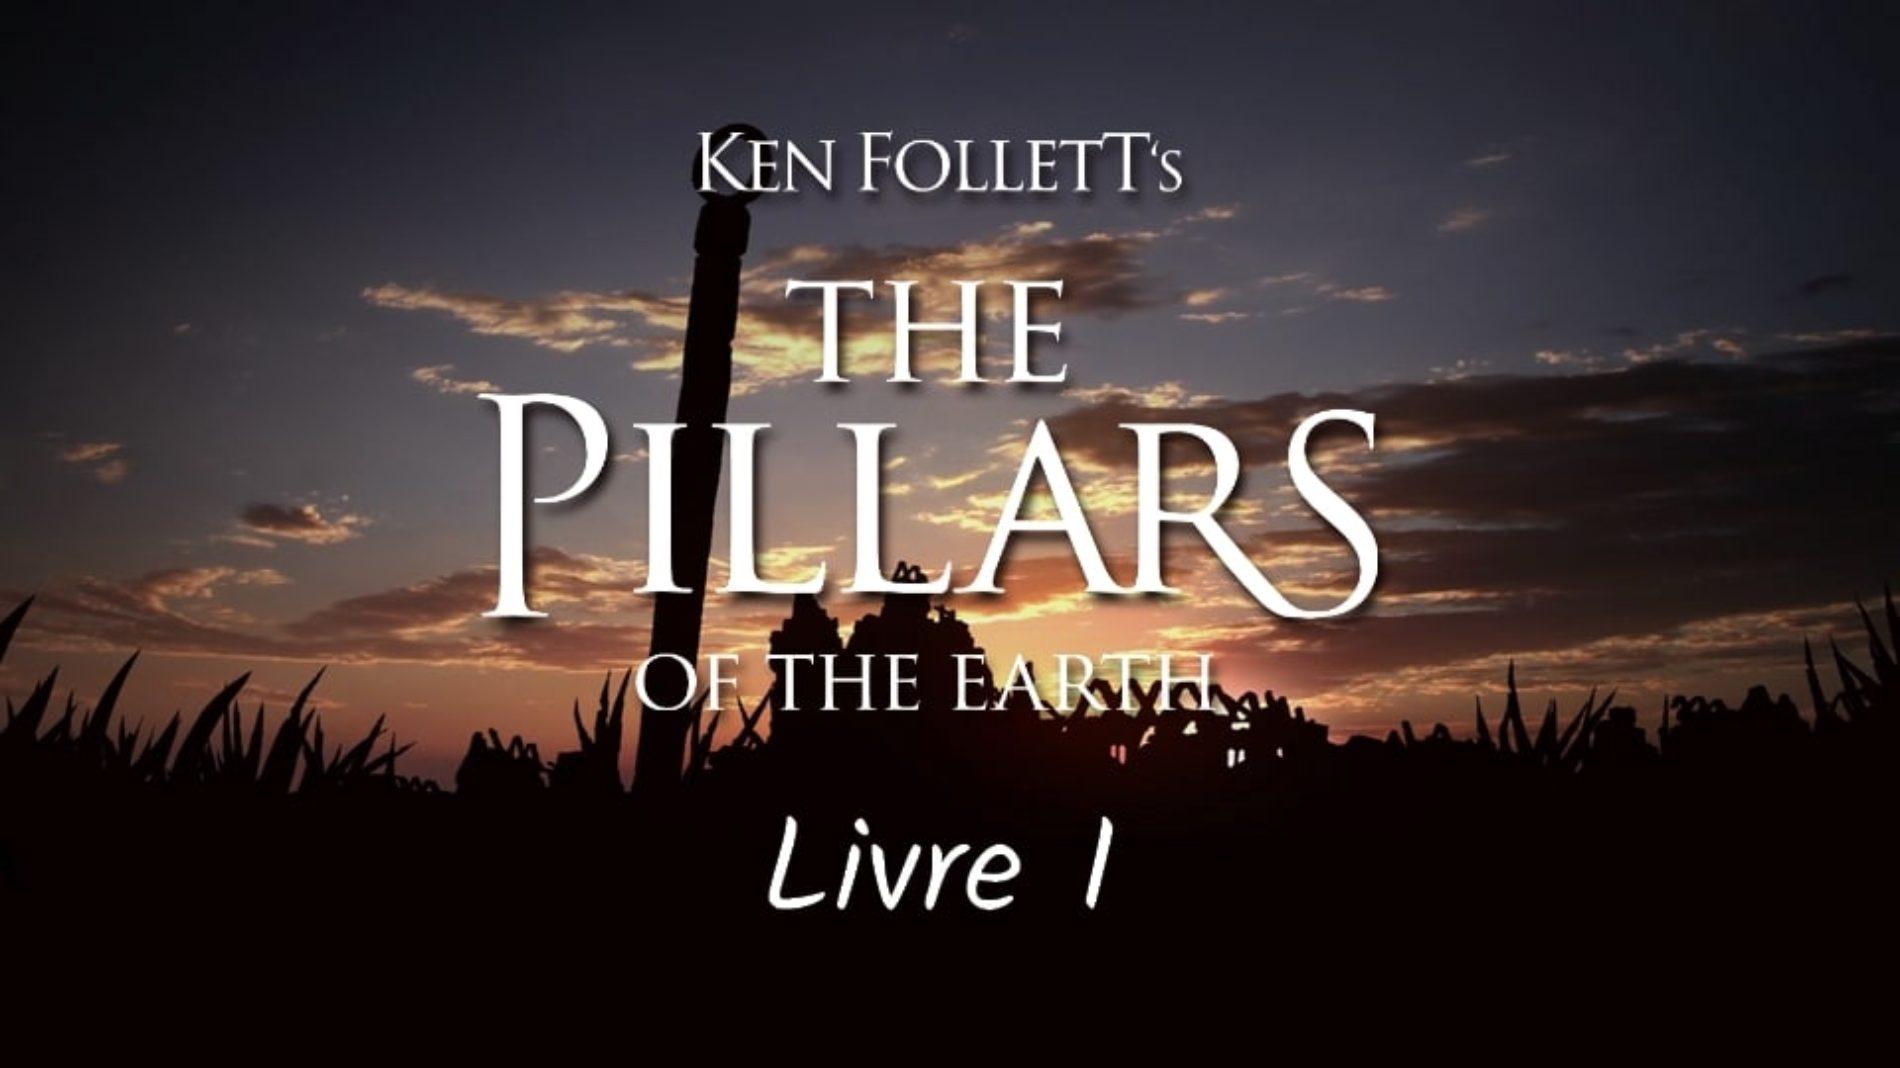 Ken Follett's Les Piliers de la Terre – Livre 1